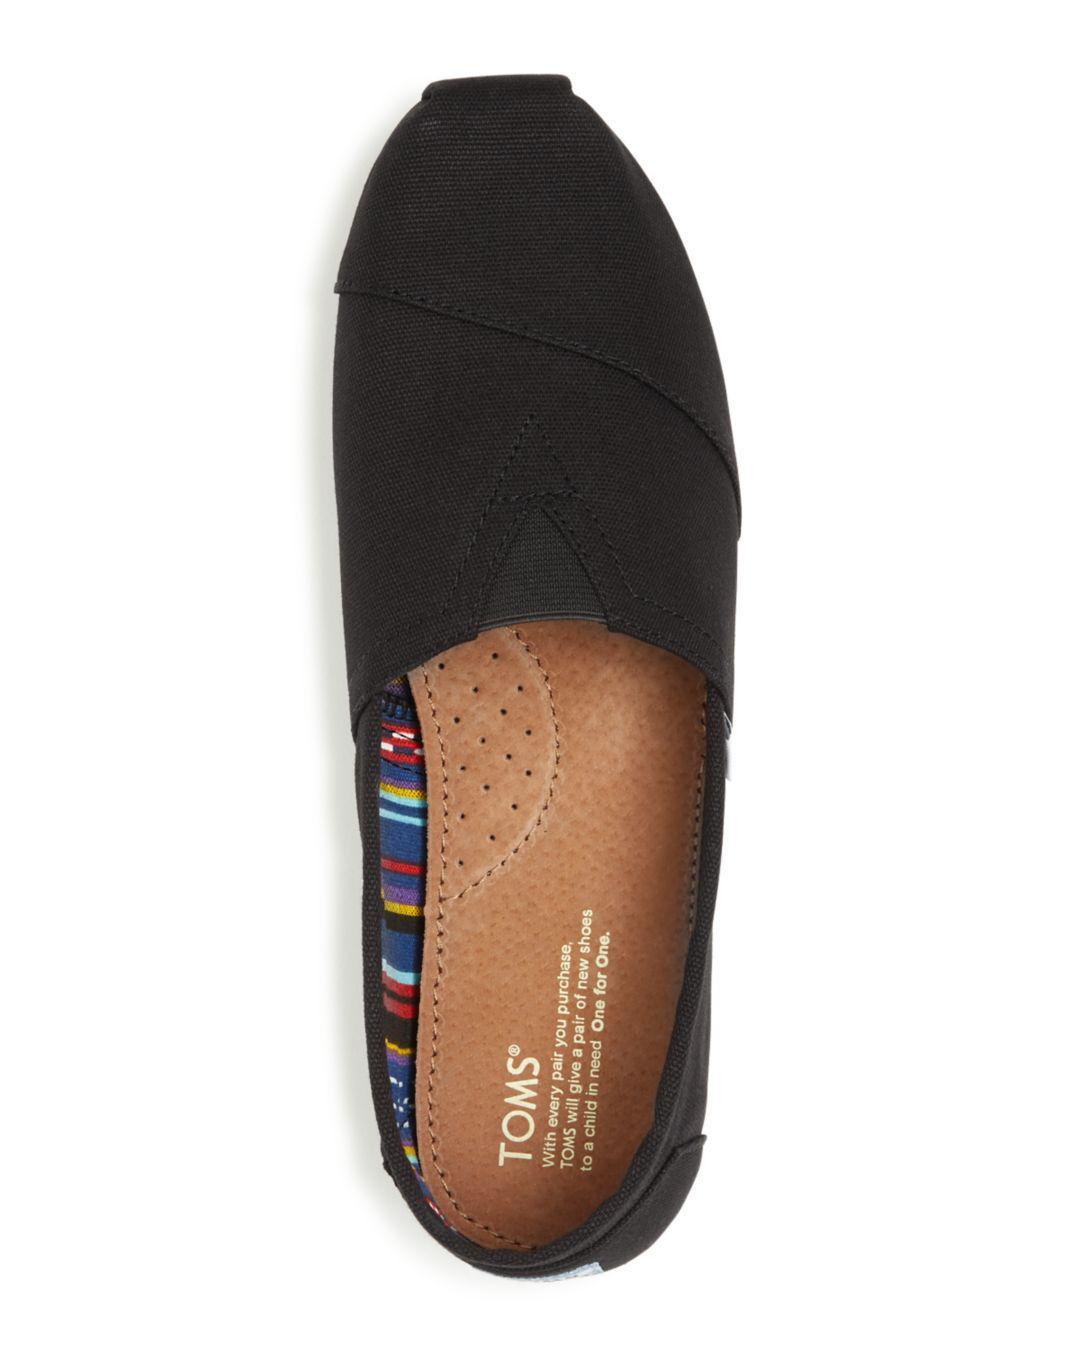 3171ceddc6d TOMS Men s Classic Canvas Slip-ons in Black for Men - Save 40% - Lyst